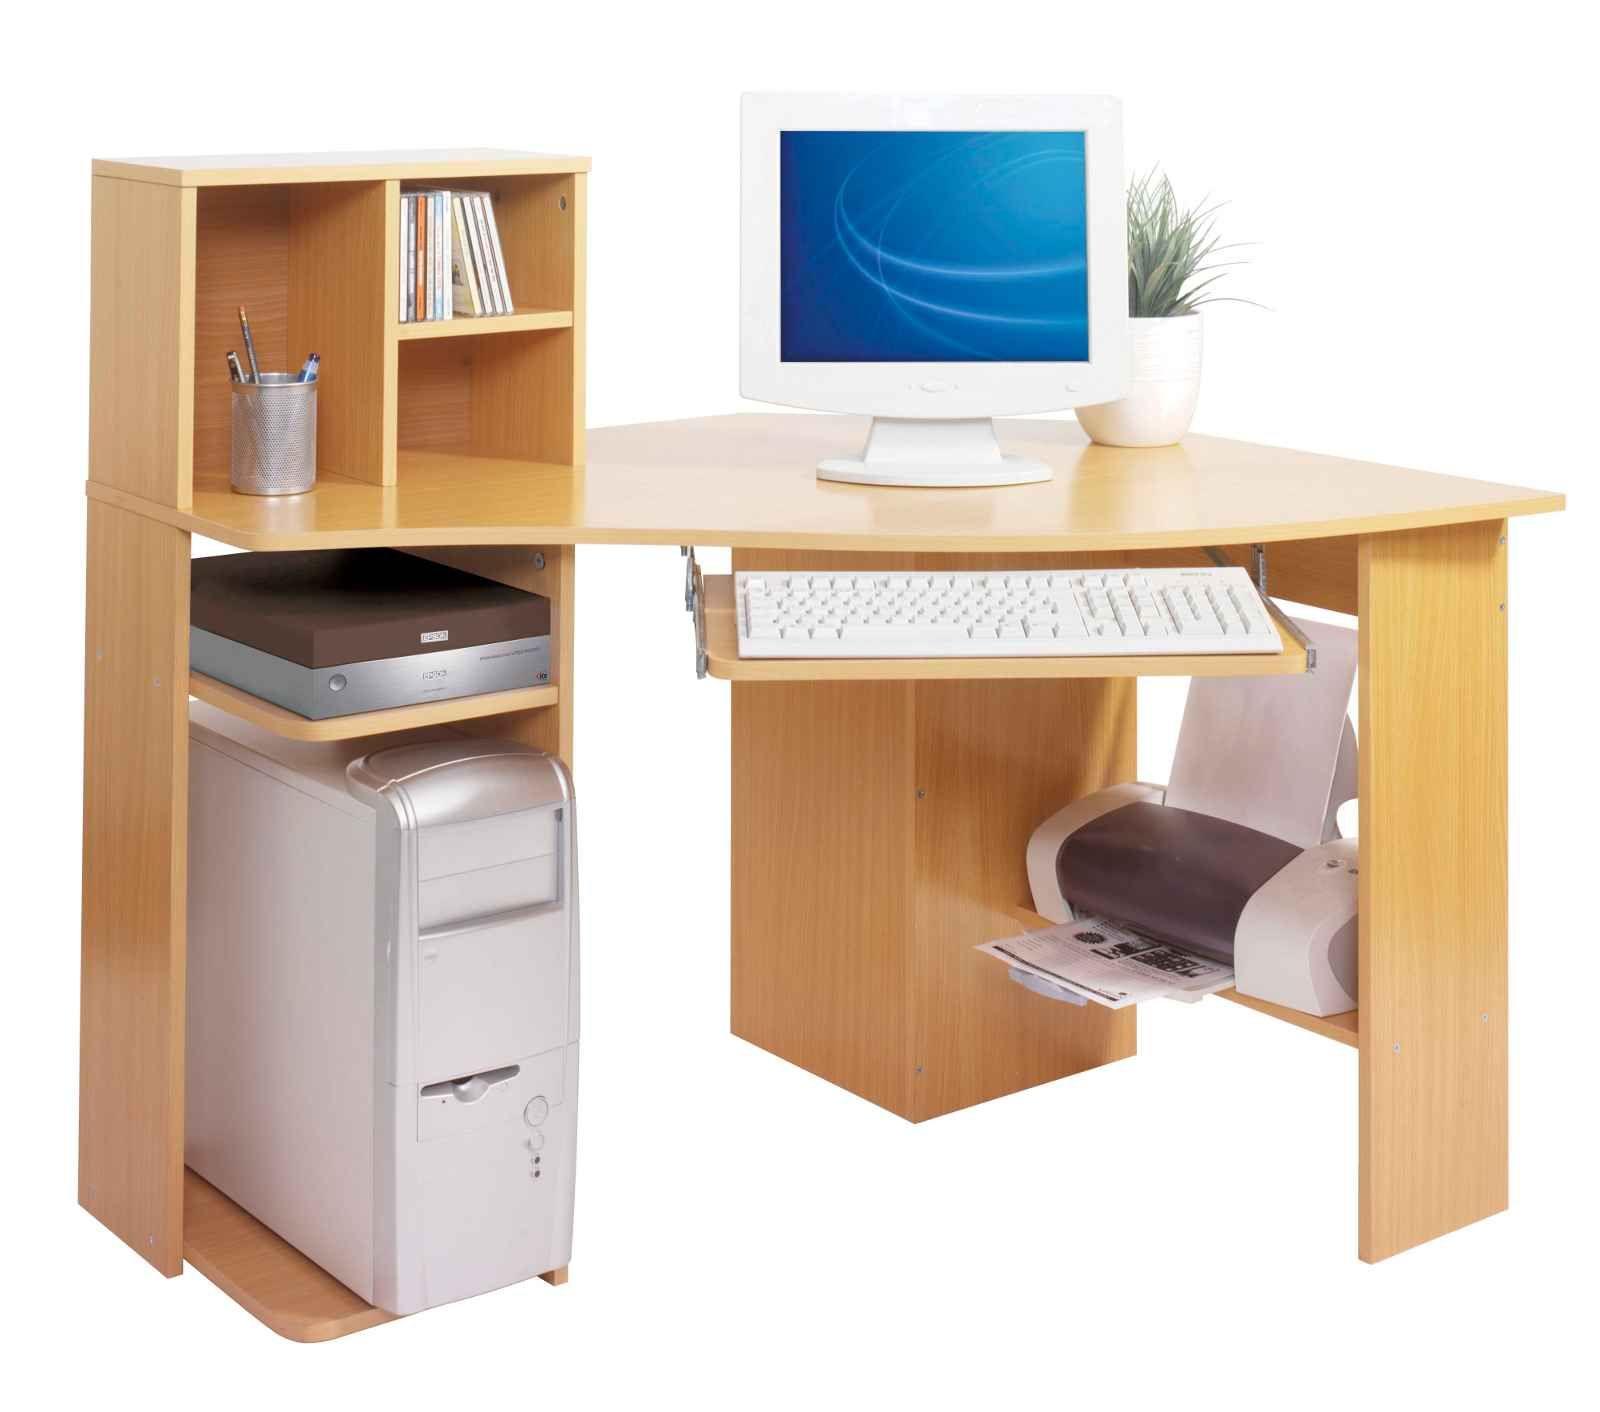 Cheap Home Office Computer Desk Furniture Modern Home Office Furniture Office Desk For Sale Office Furniture Modern